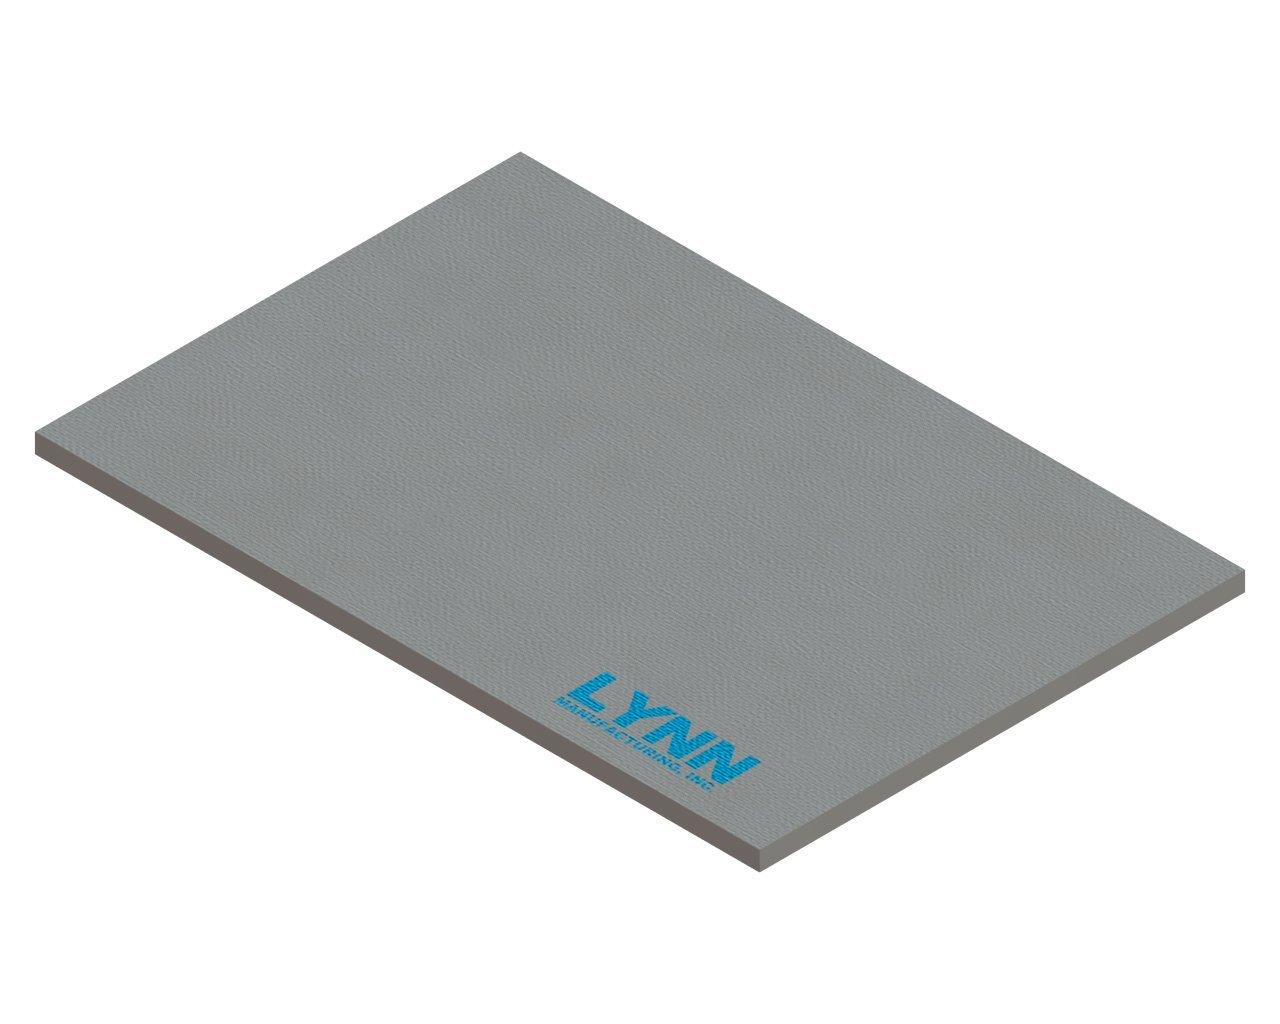 Lynn Manufacturing Replacement Quadrafire Baffle Board, 4100-I ACT, Bodega Bay, 832-3520